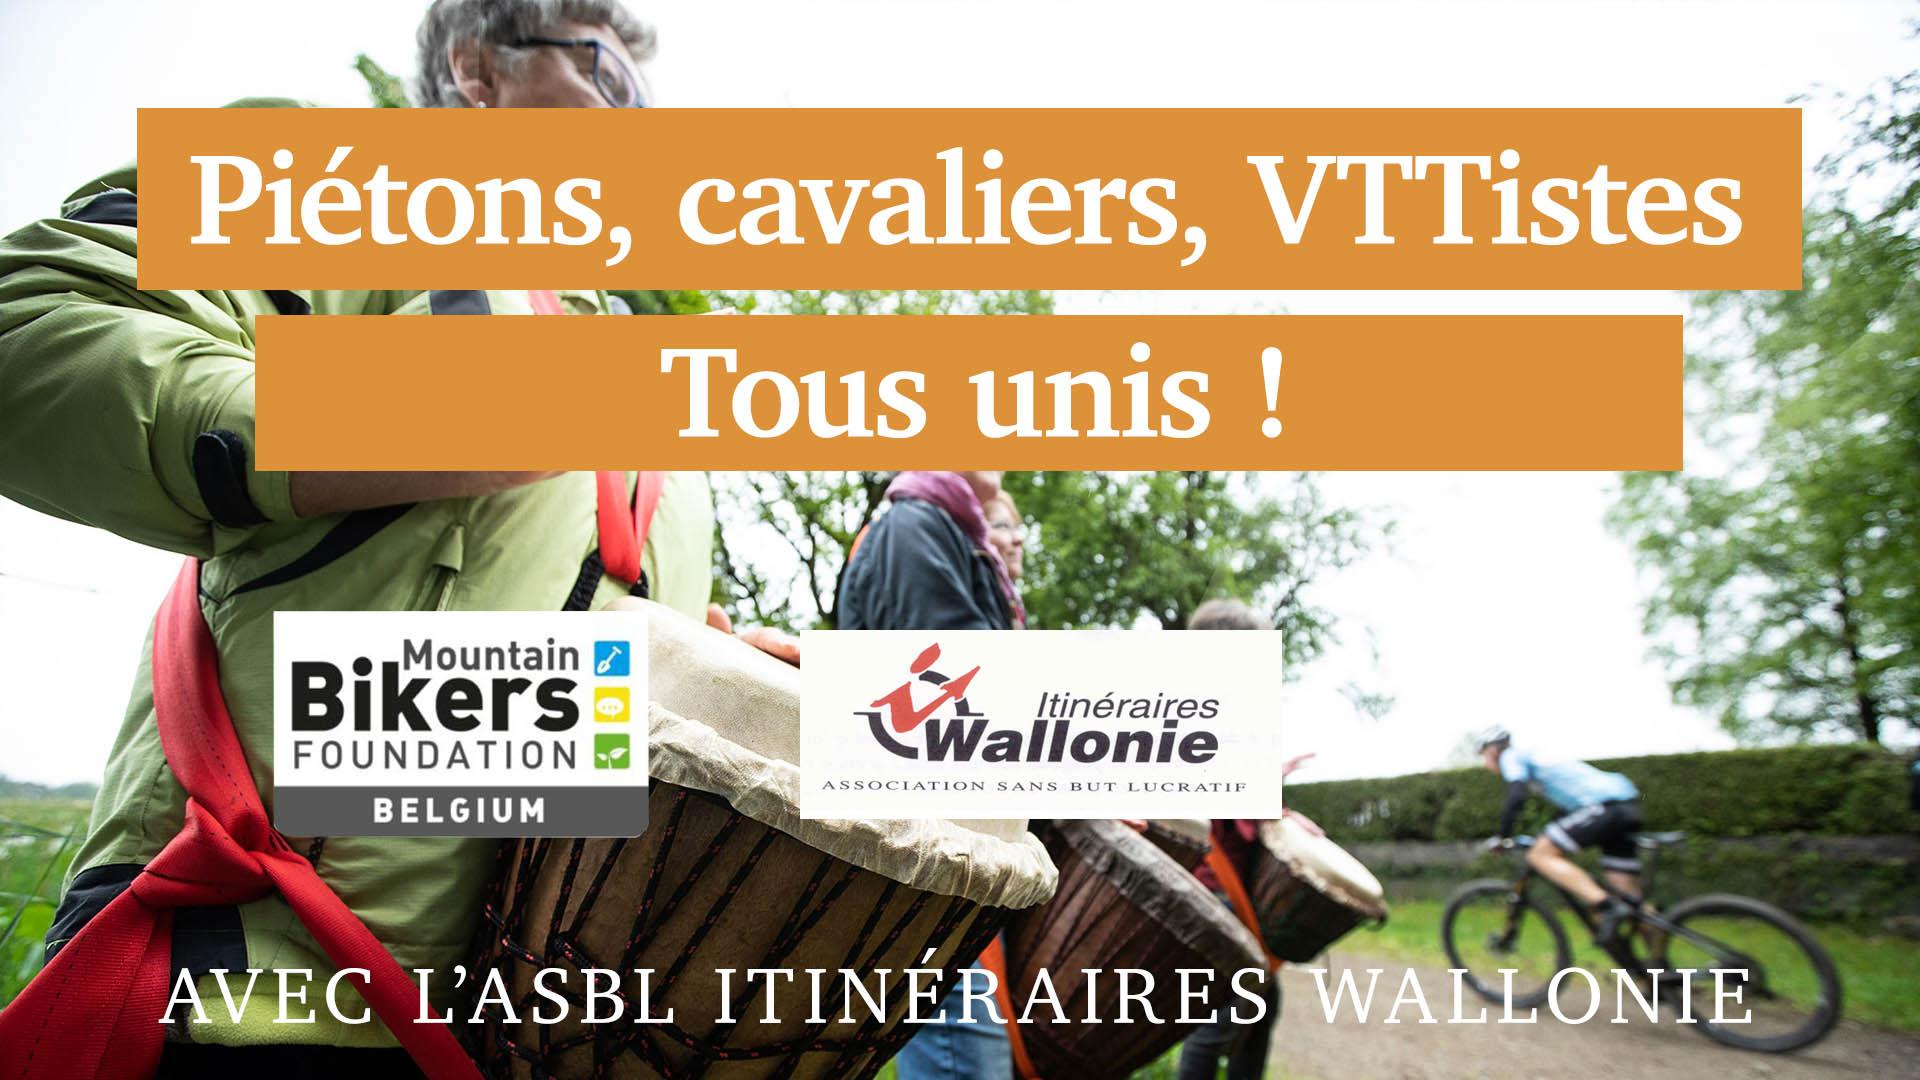 Itinéraires-wallonie-VTT